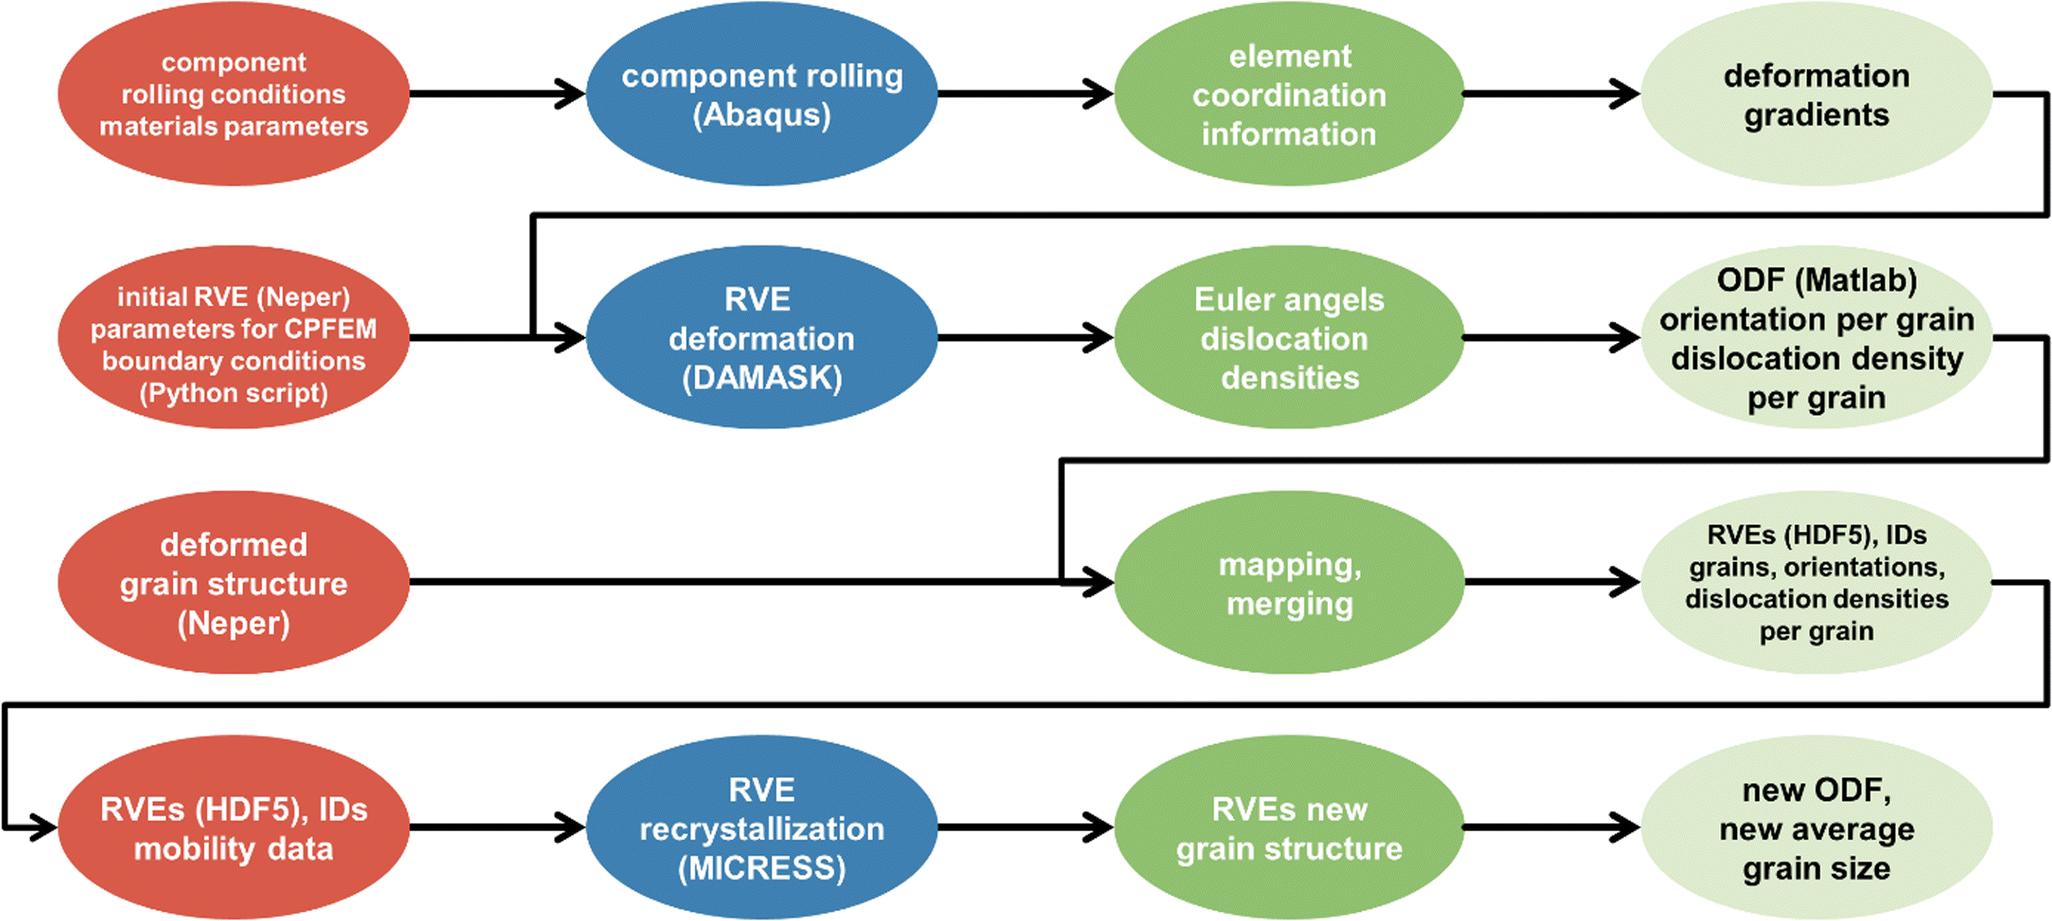 AixViPMaP®—an Operational Platform for Microstructure